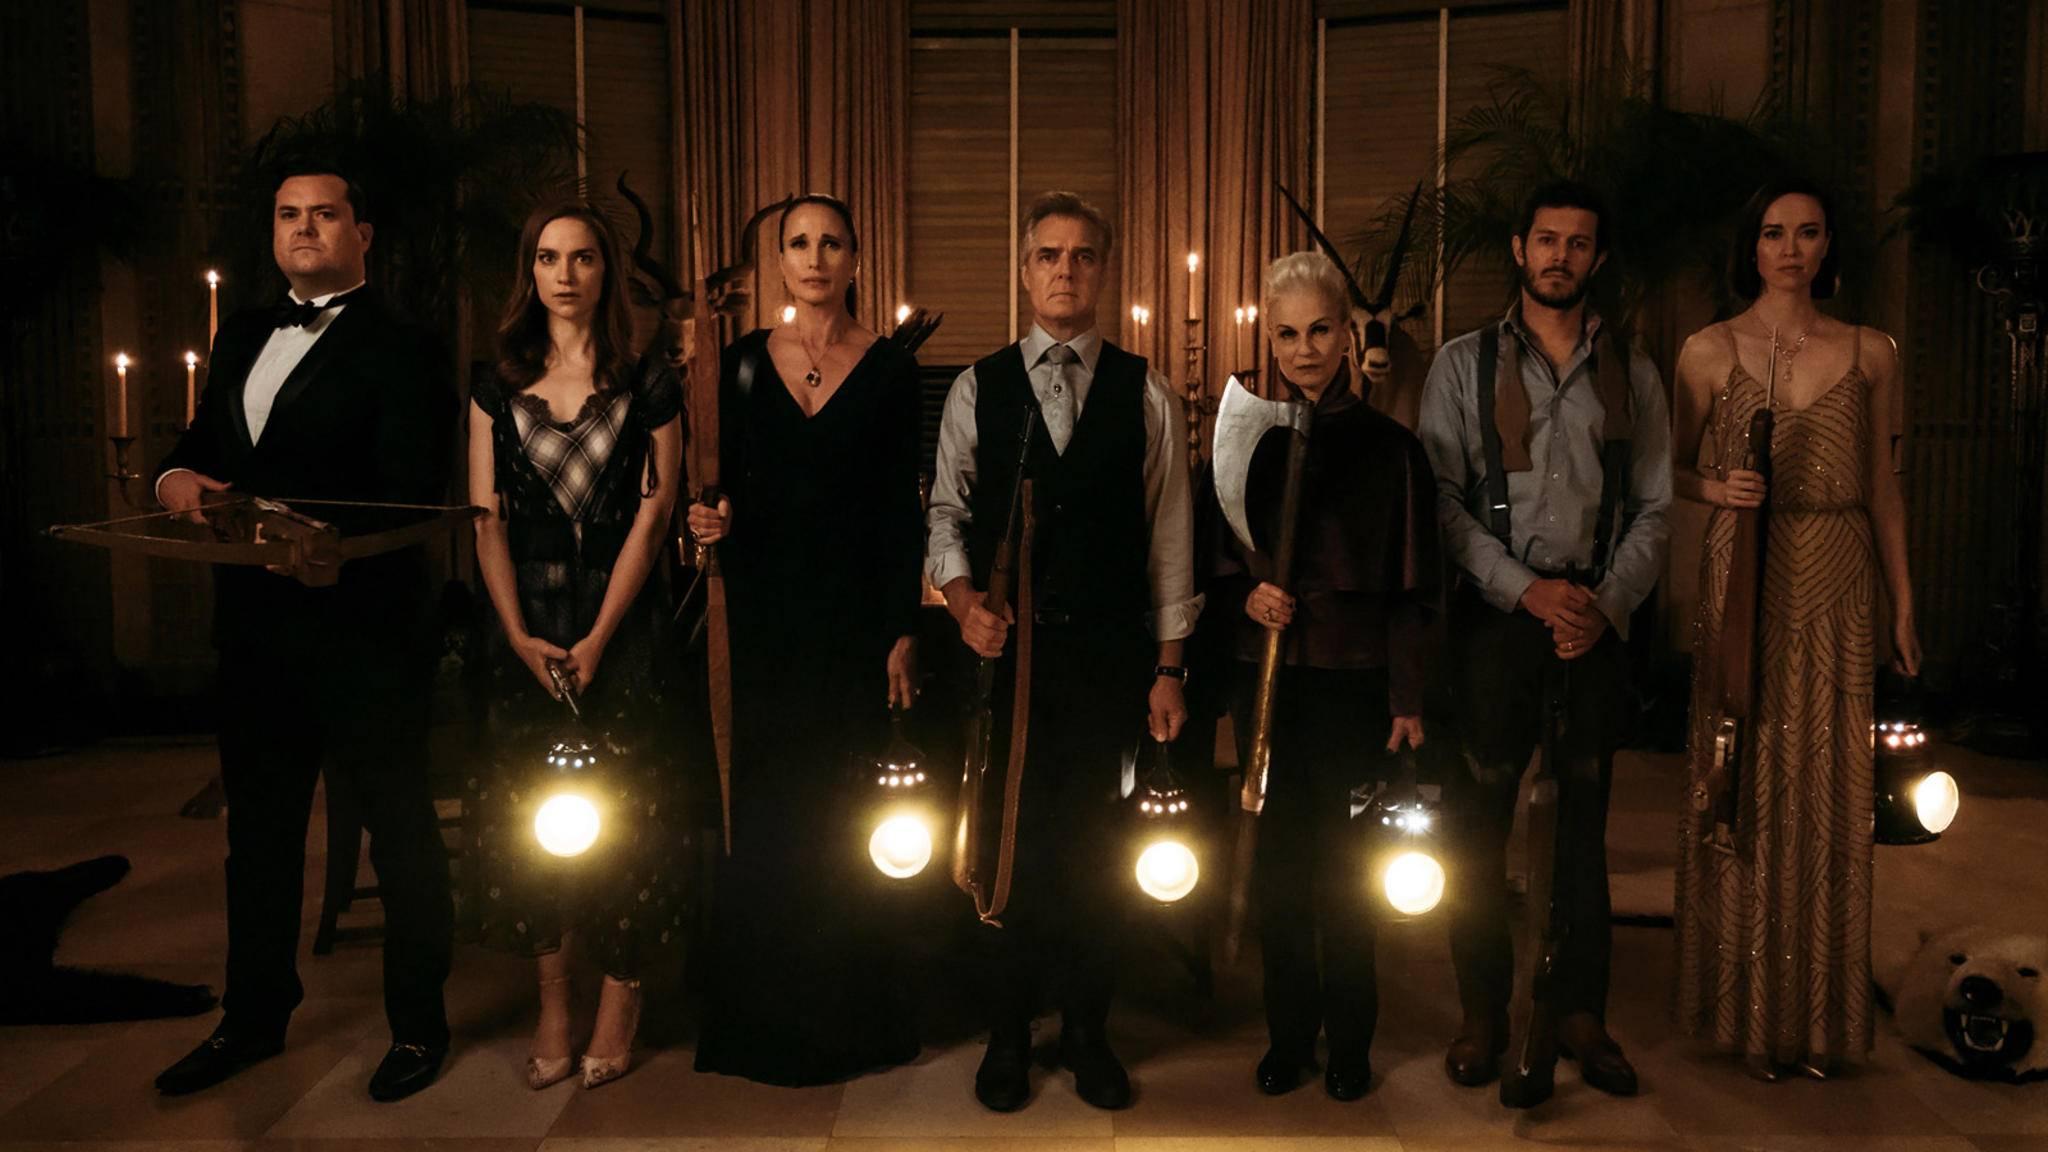 Ready or not-Familie Le Domas-Eric Zachanowich-Twentieth Century Fox